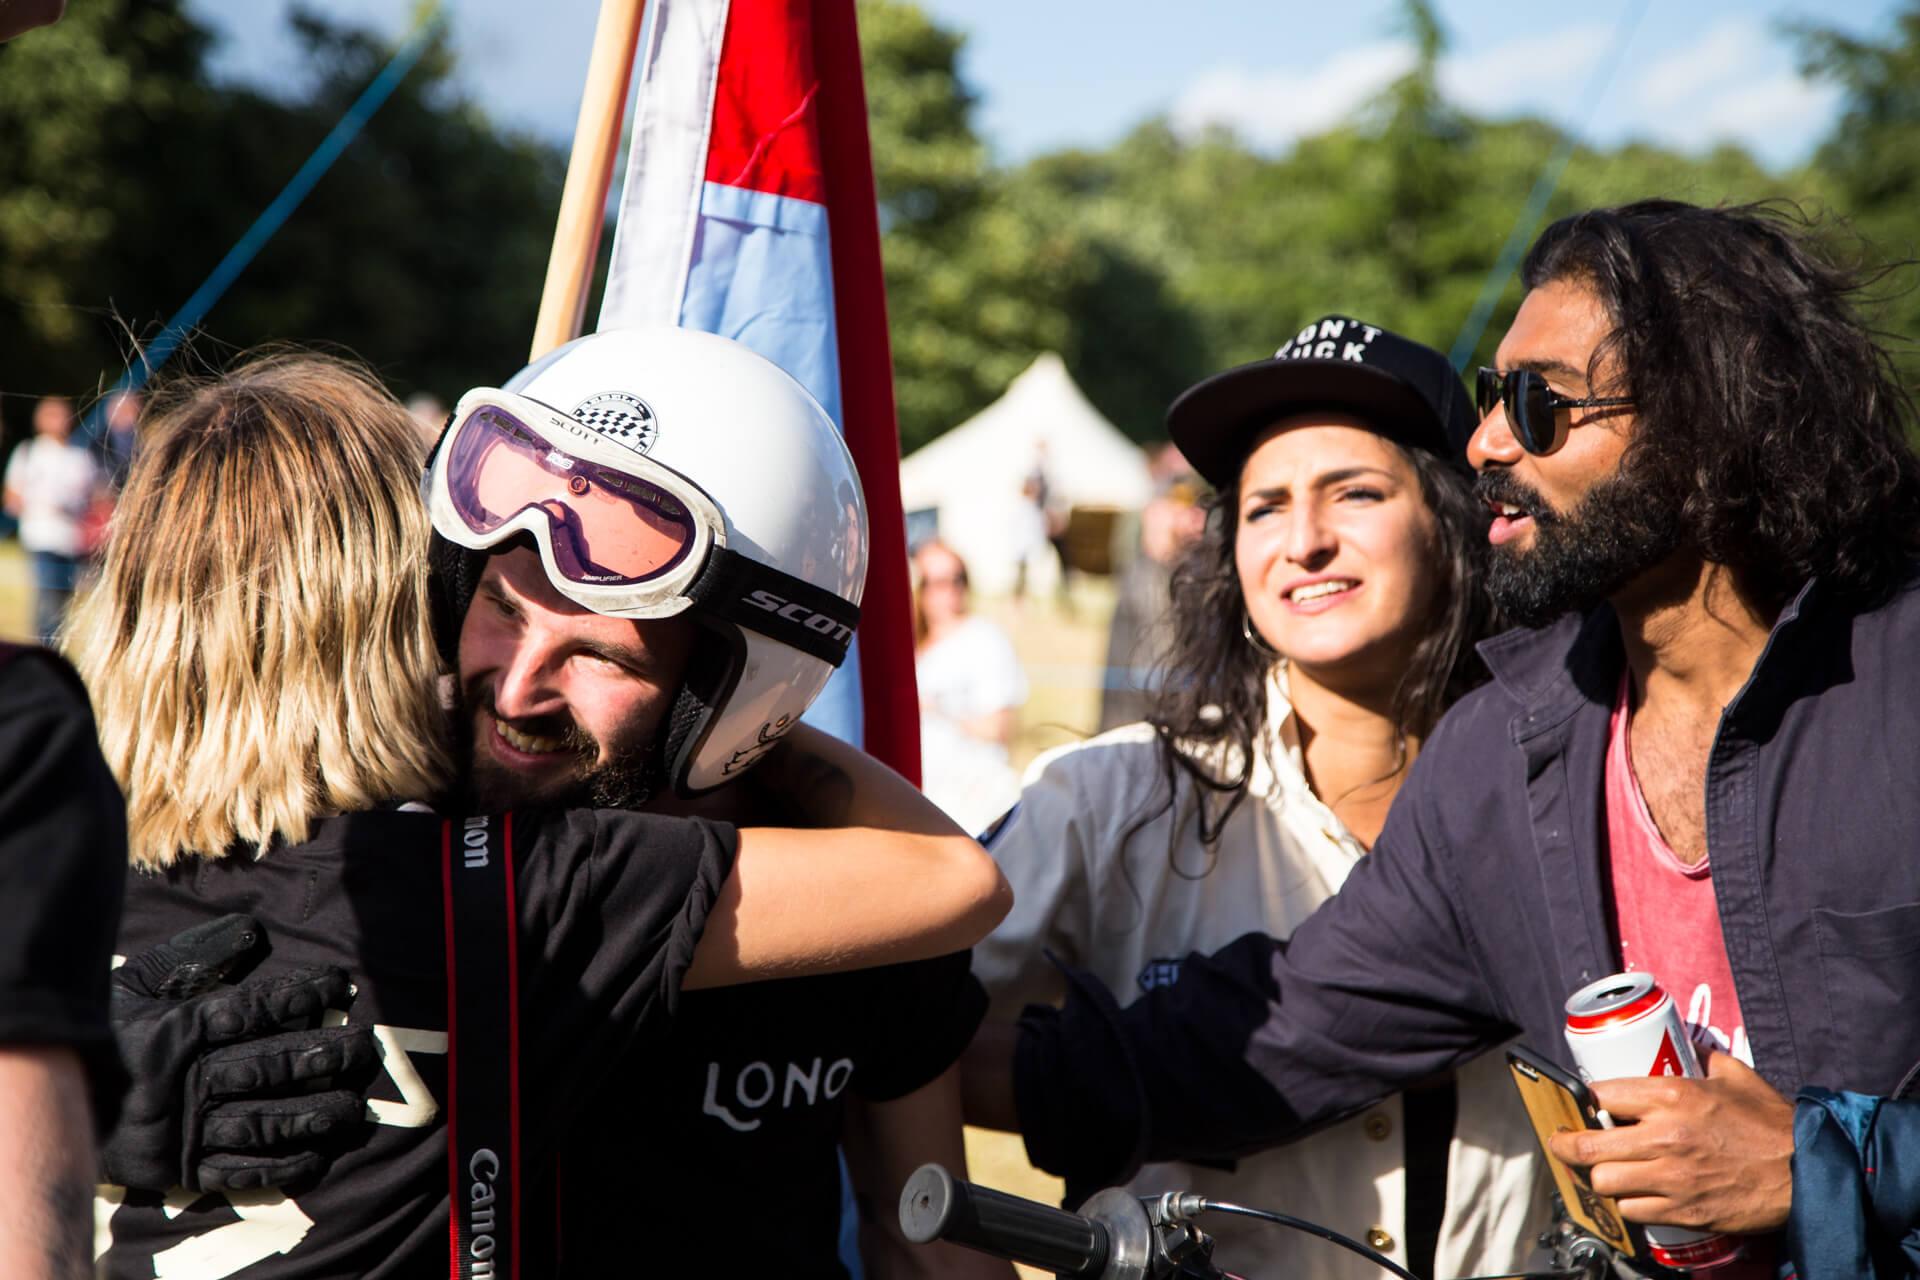 Malle Mile, Event, Motorcycle, Richard, Summer, WeAreShuffle, Agency, Photography, Film, Production, Malle London, Triumph, Flag, Biker, Field, Race, Helmet, Dirt, Finish